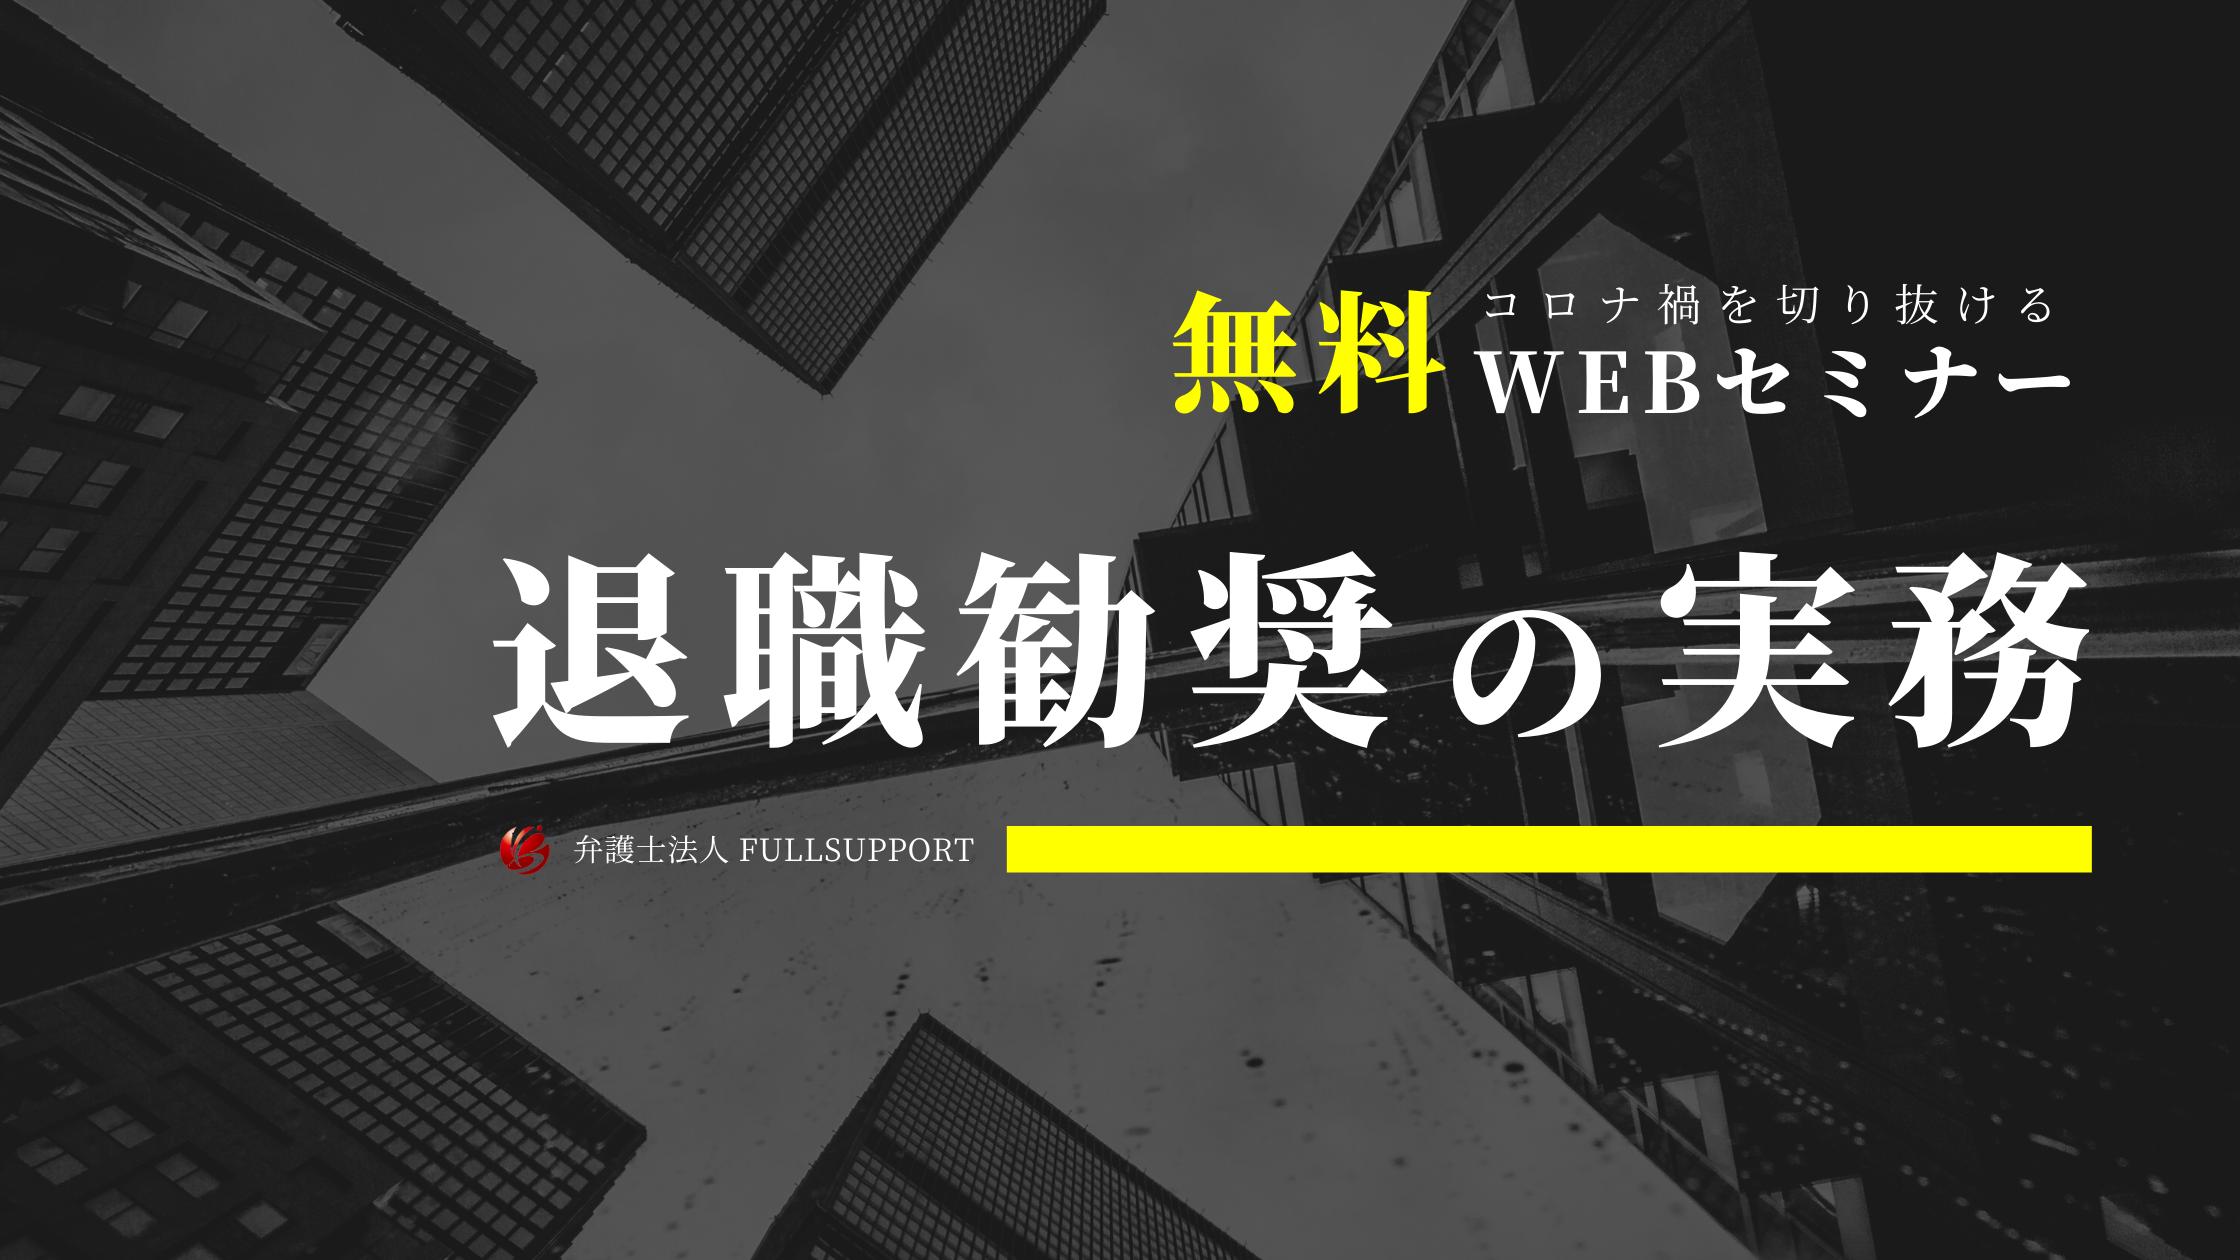 Webセミナー「退職勧奨-コロナ不況に負けない経営知識」7月21日・28日・30日開催